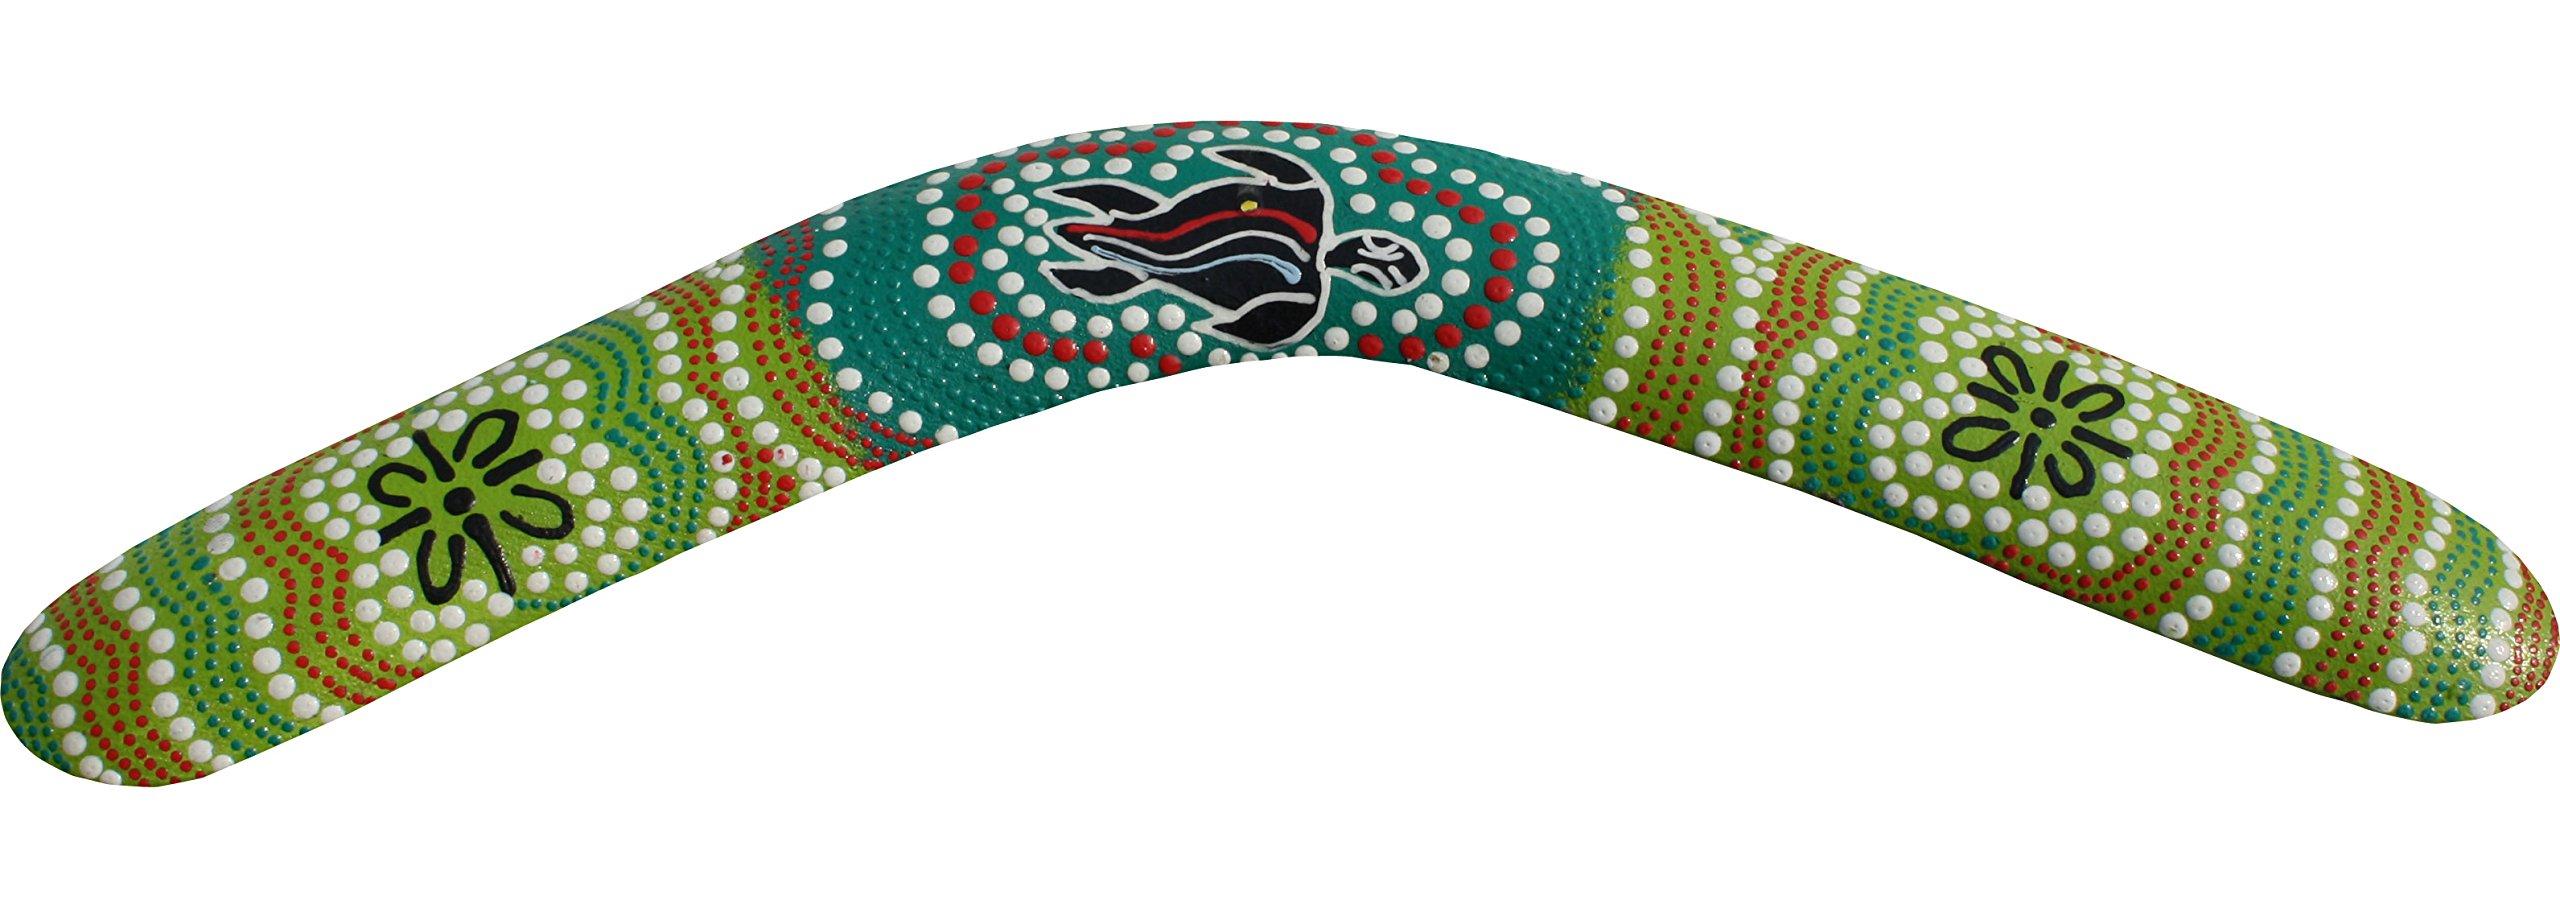 Raan Pah Muang Brand Thai Made Australian Aboriginal Art Decorative Boomerang #88373 by Raan Pah Muang